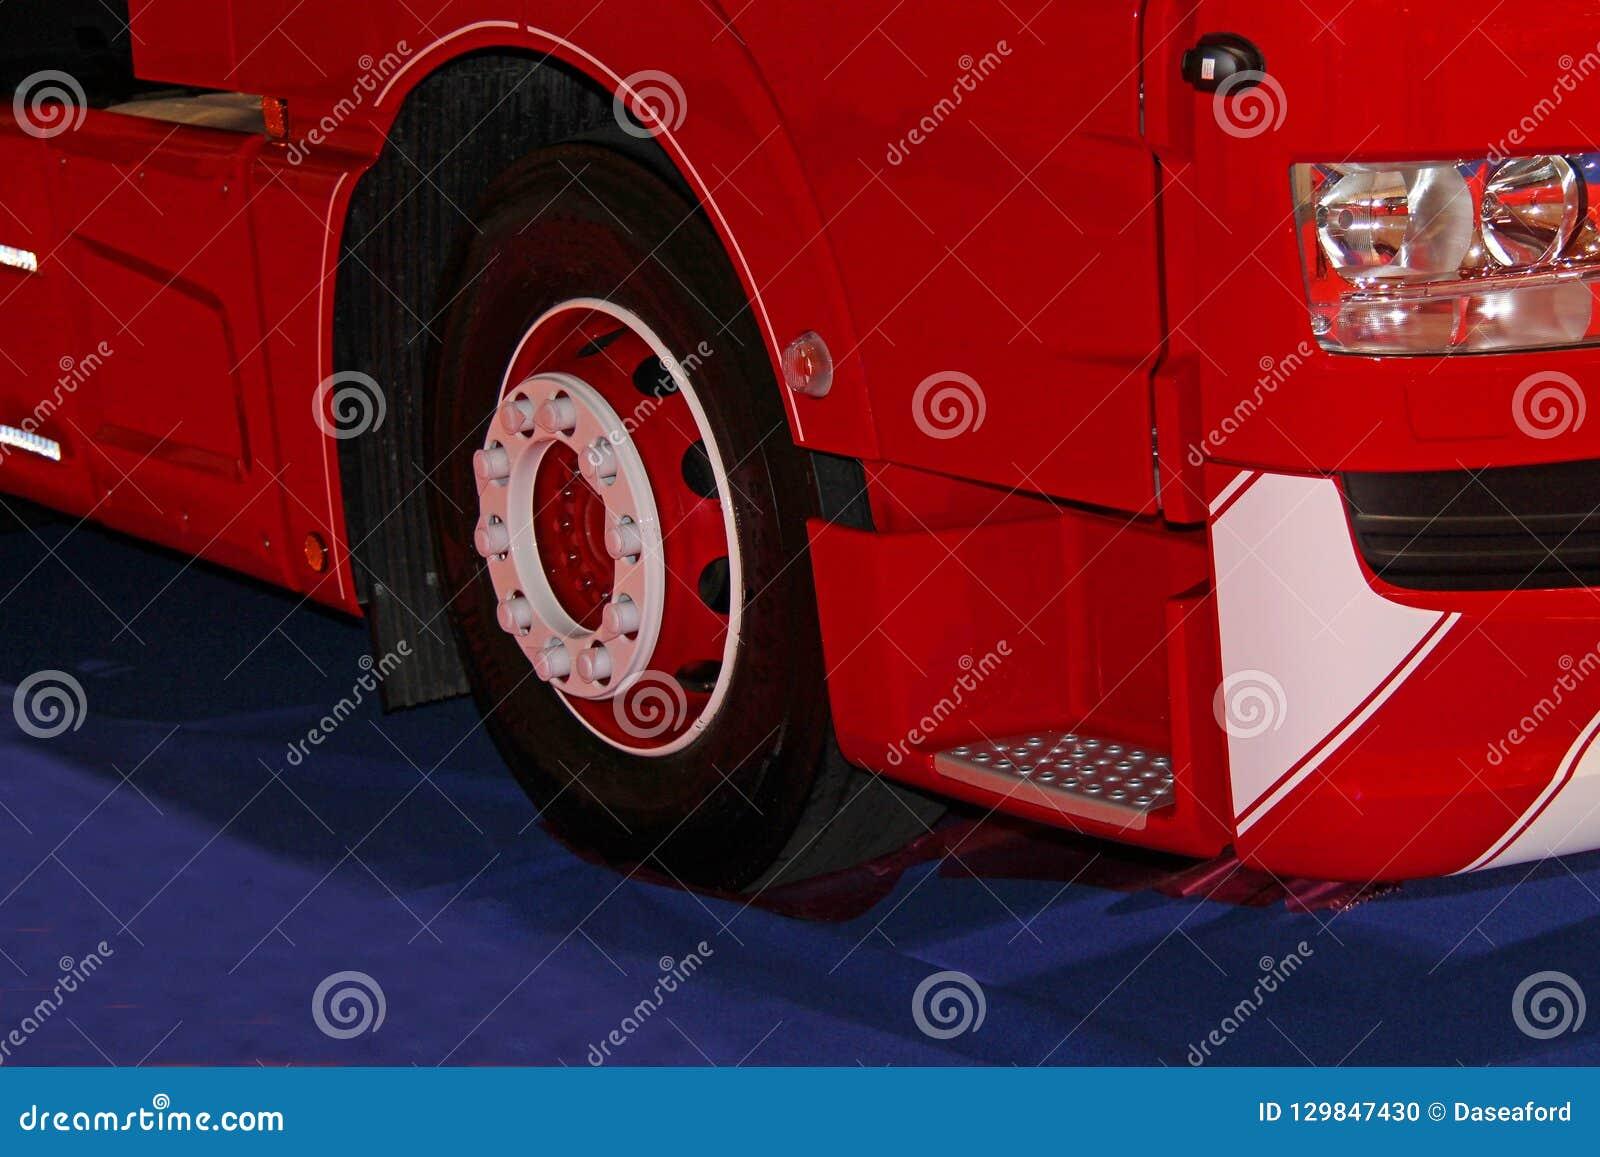 Lorry Truck Cab